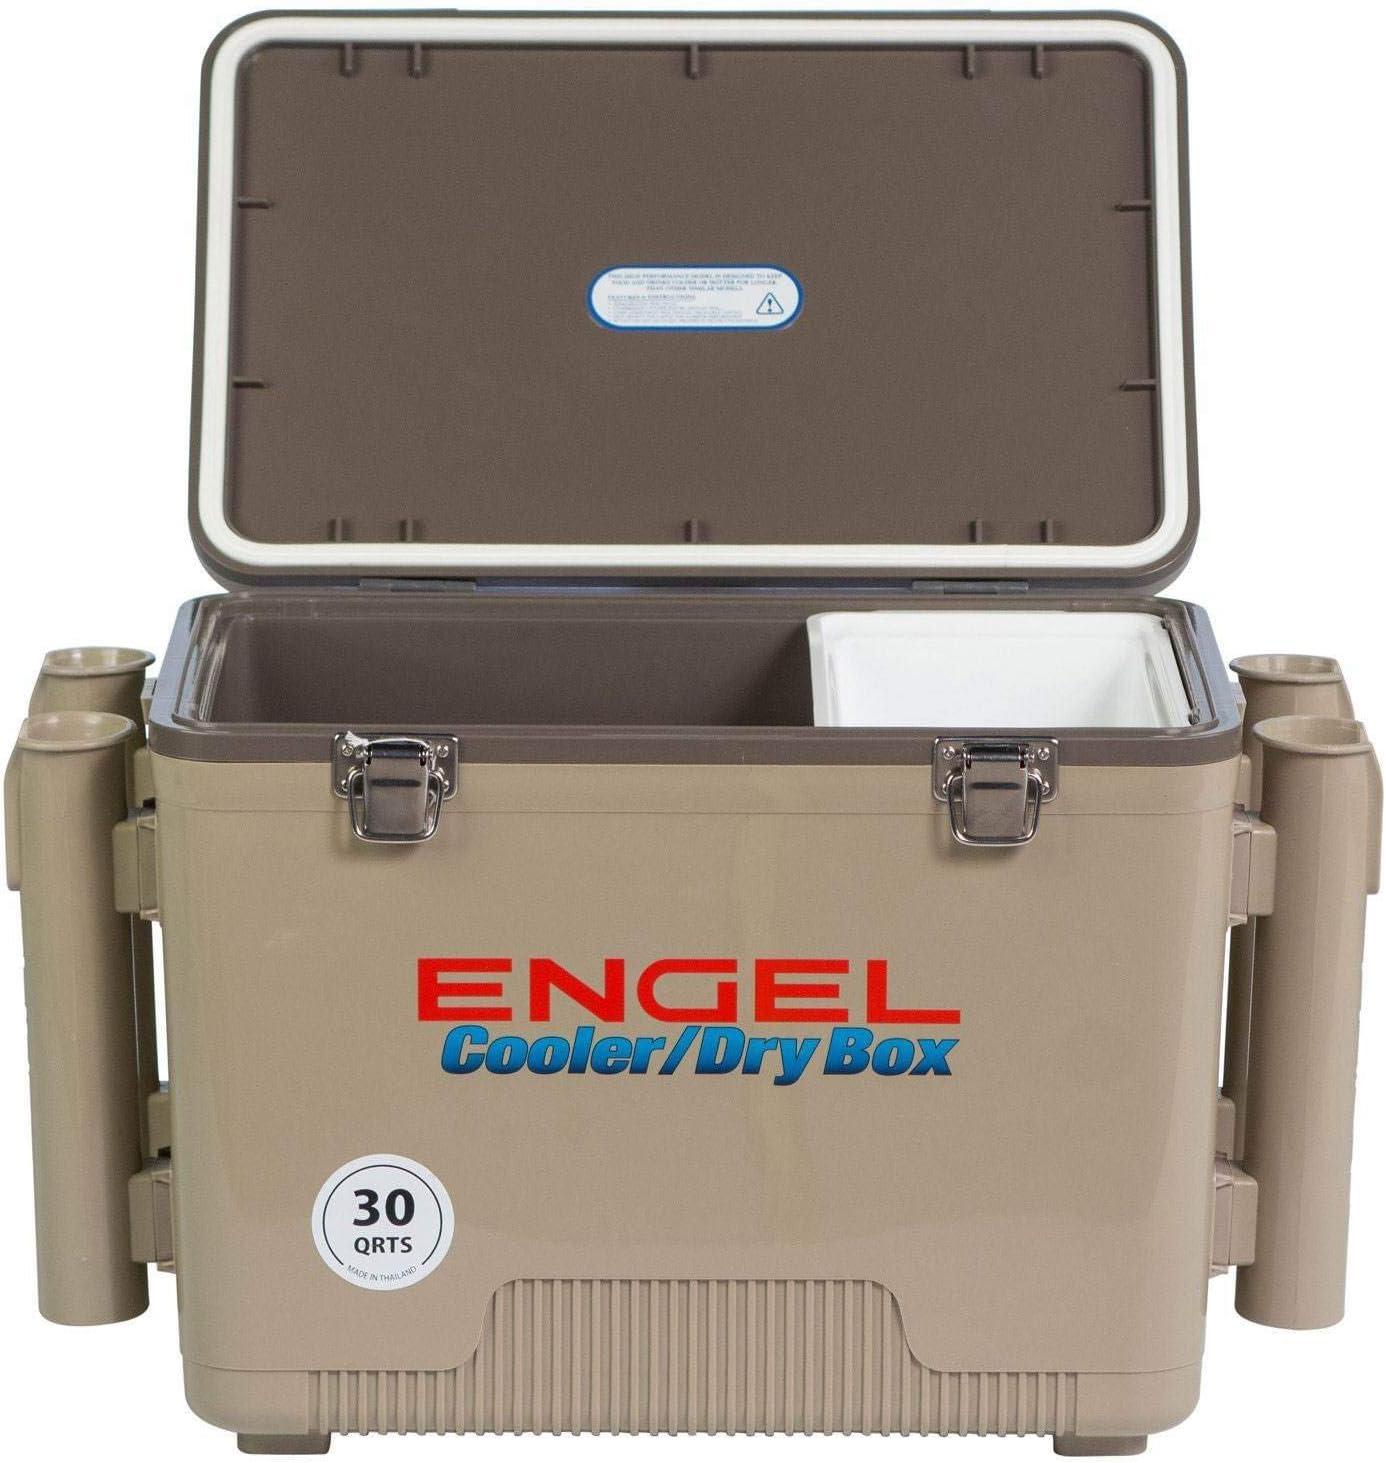 Engel USA Cooler/Dry Box, 30 Quart